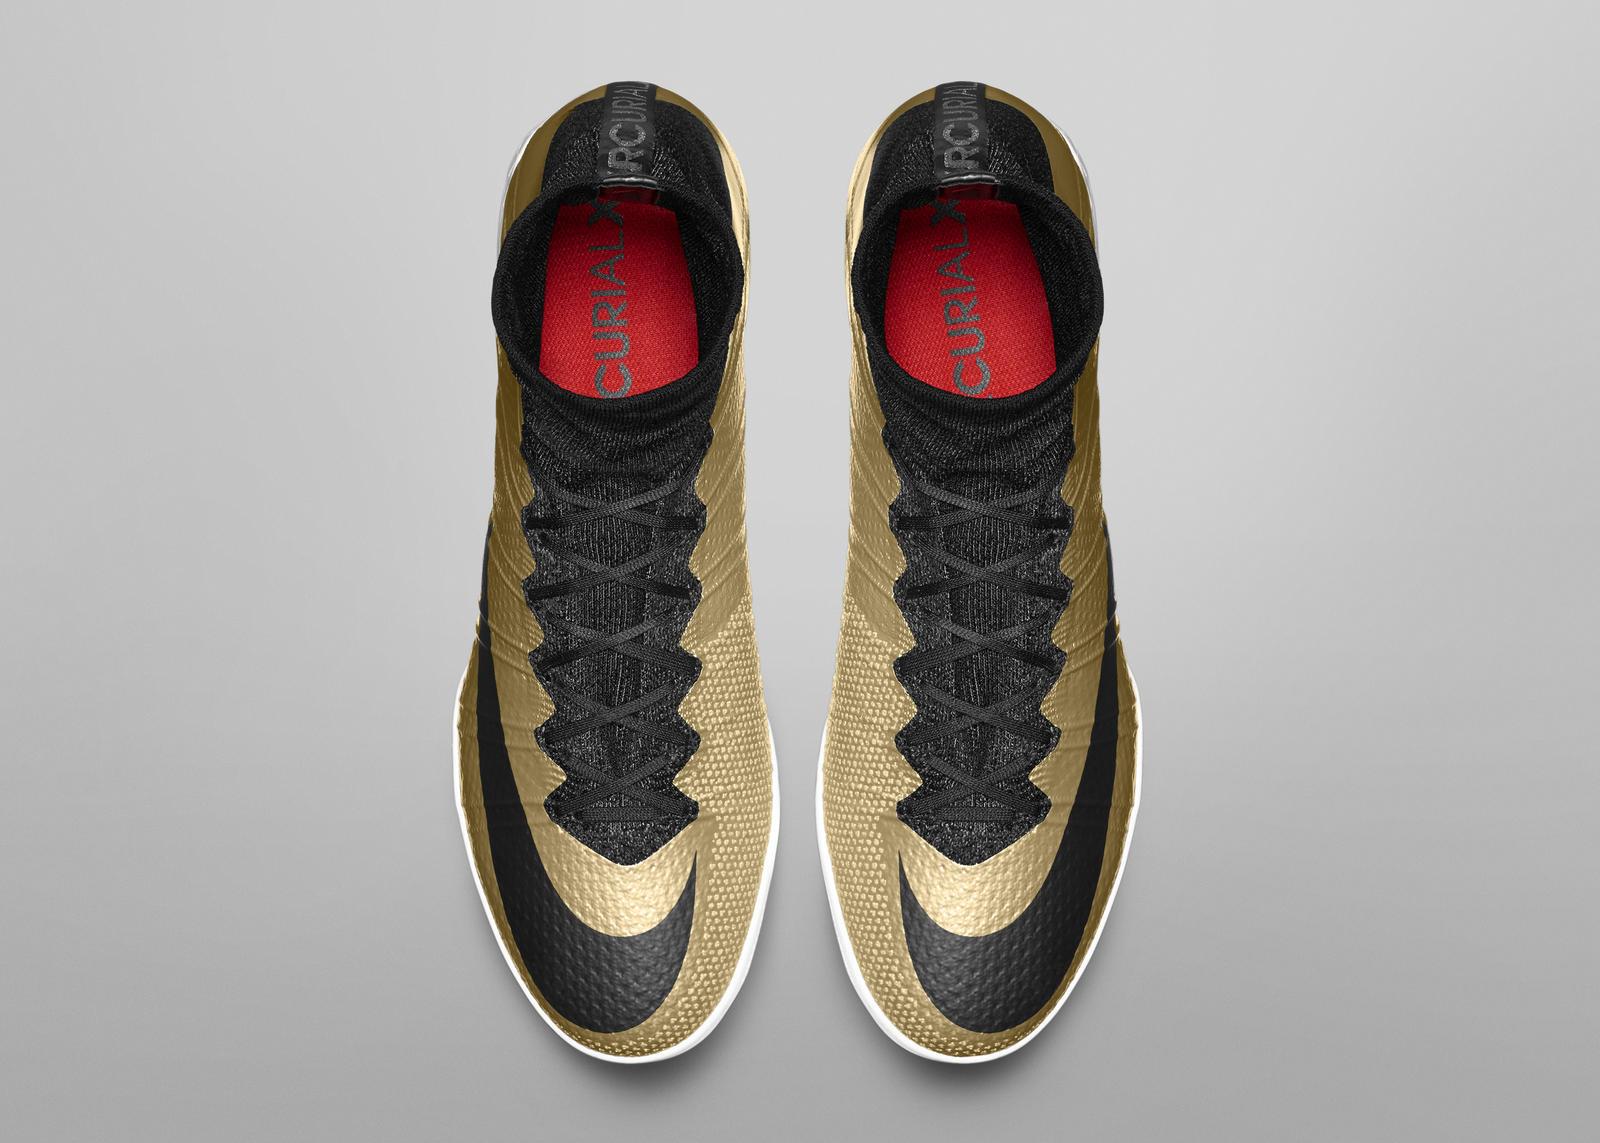 Nike-Football-Soccer_NFX_STREET_MERCURIALX_PROXIMO_IC_D_PREM